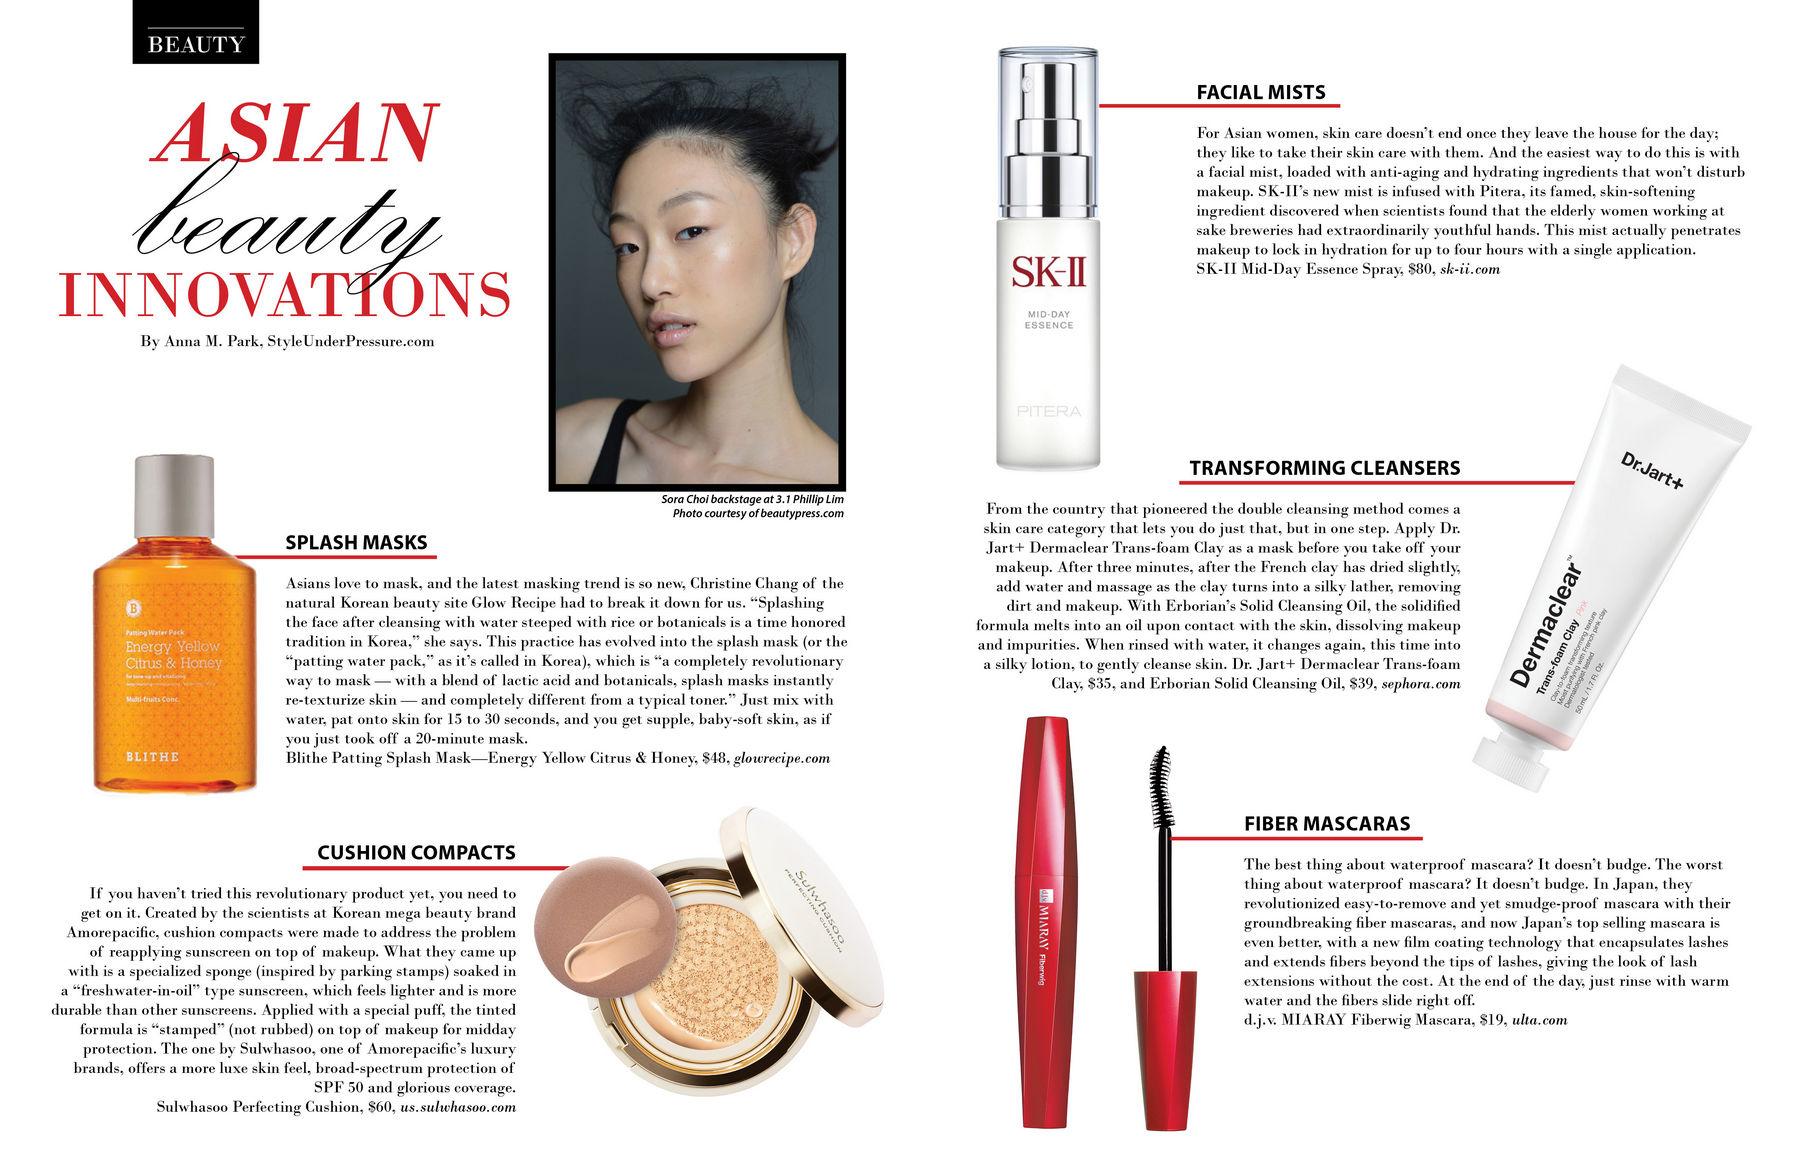 Asian Beauty Innovations